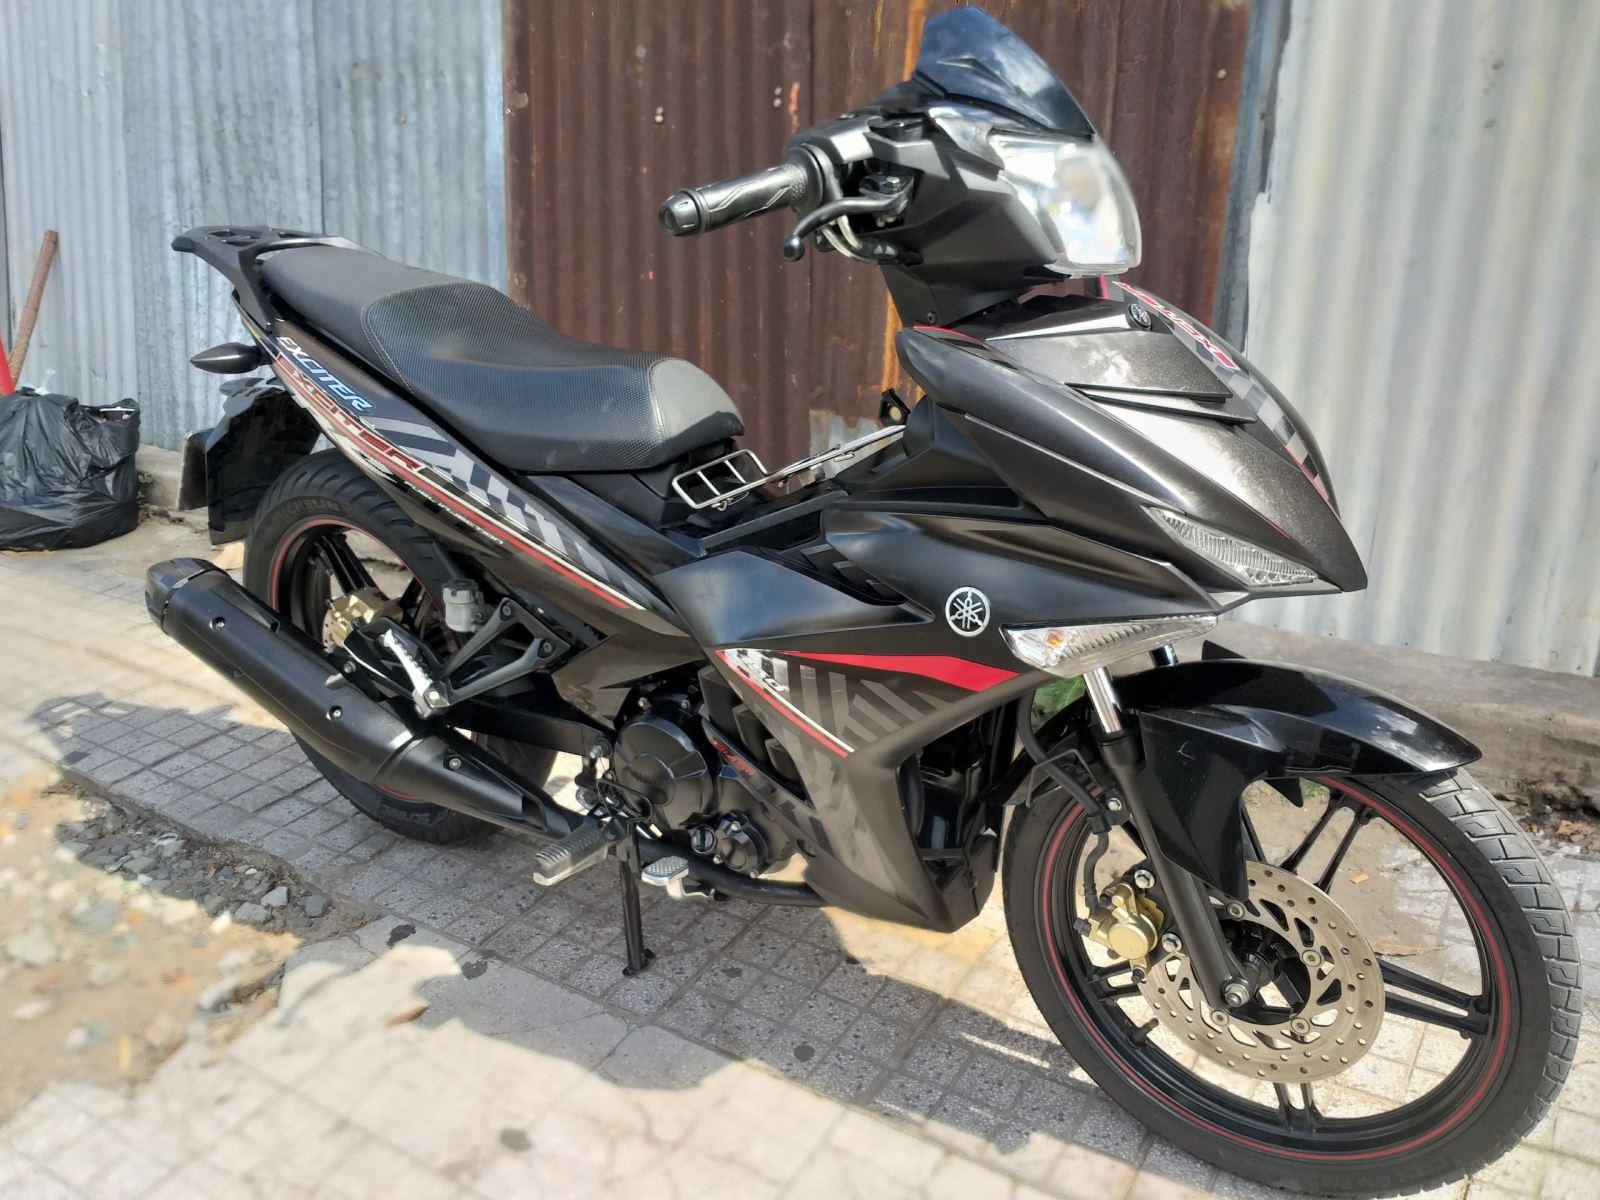 Yamaha Exciter 150cc 2018 đen nhám bstp bán 29tr8